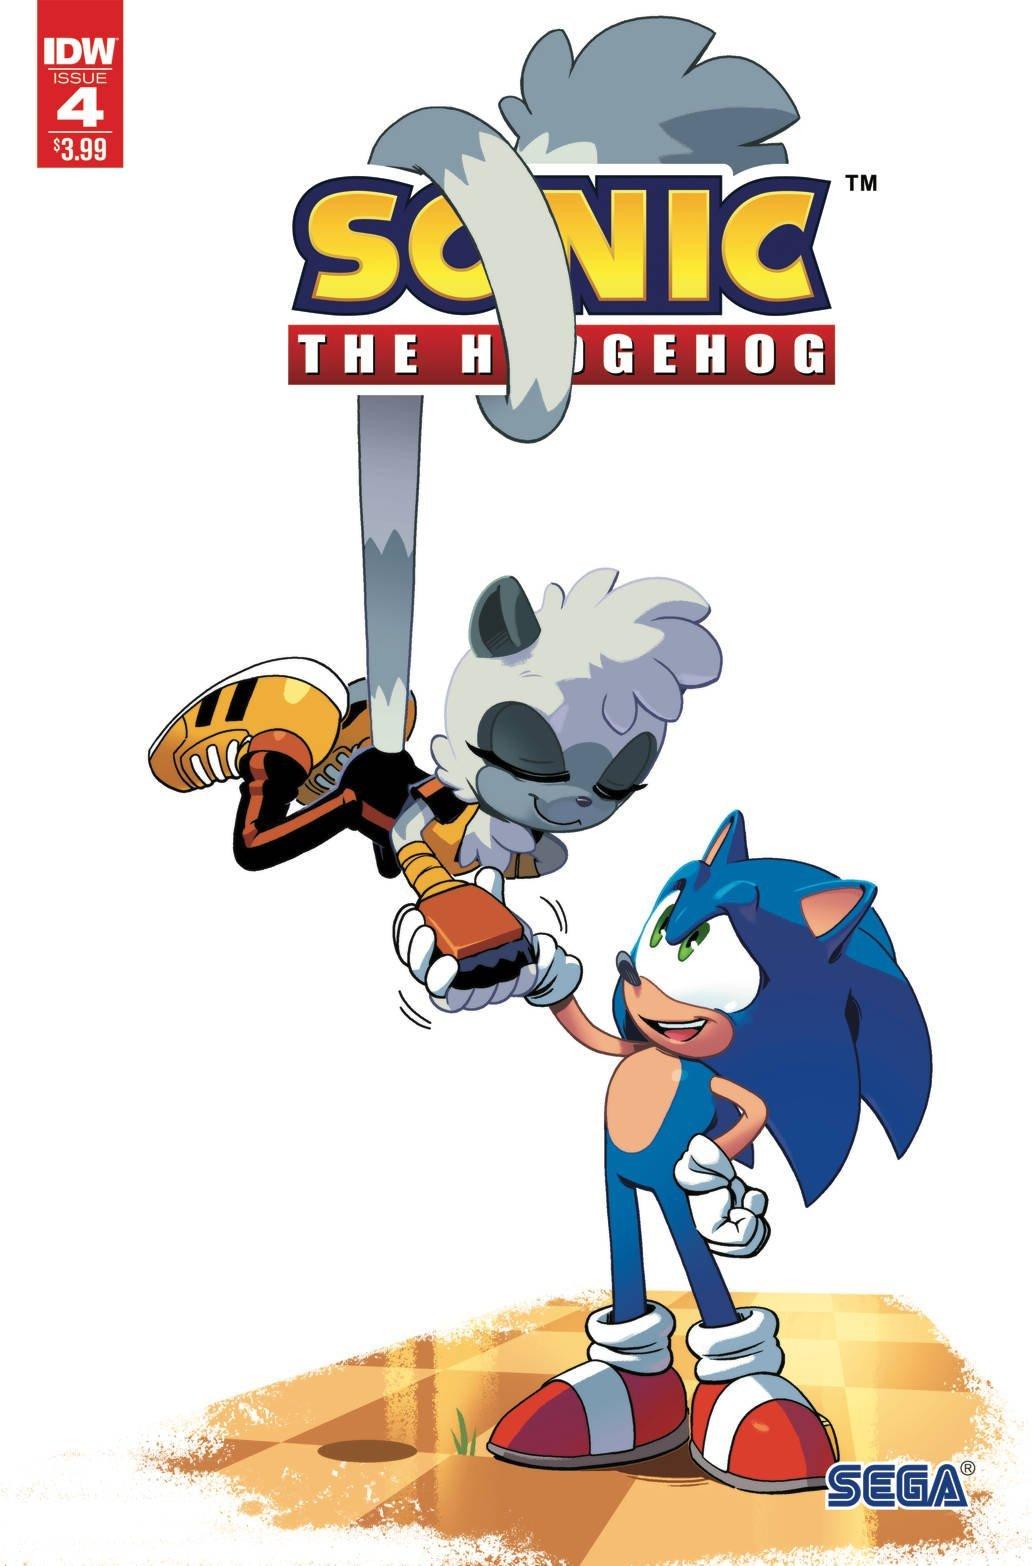 Sonic the Hedgehog 004 (April 2018) (2nd printing)